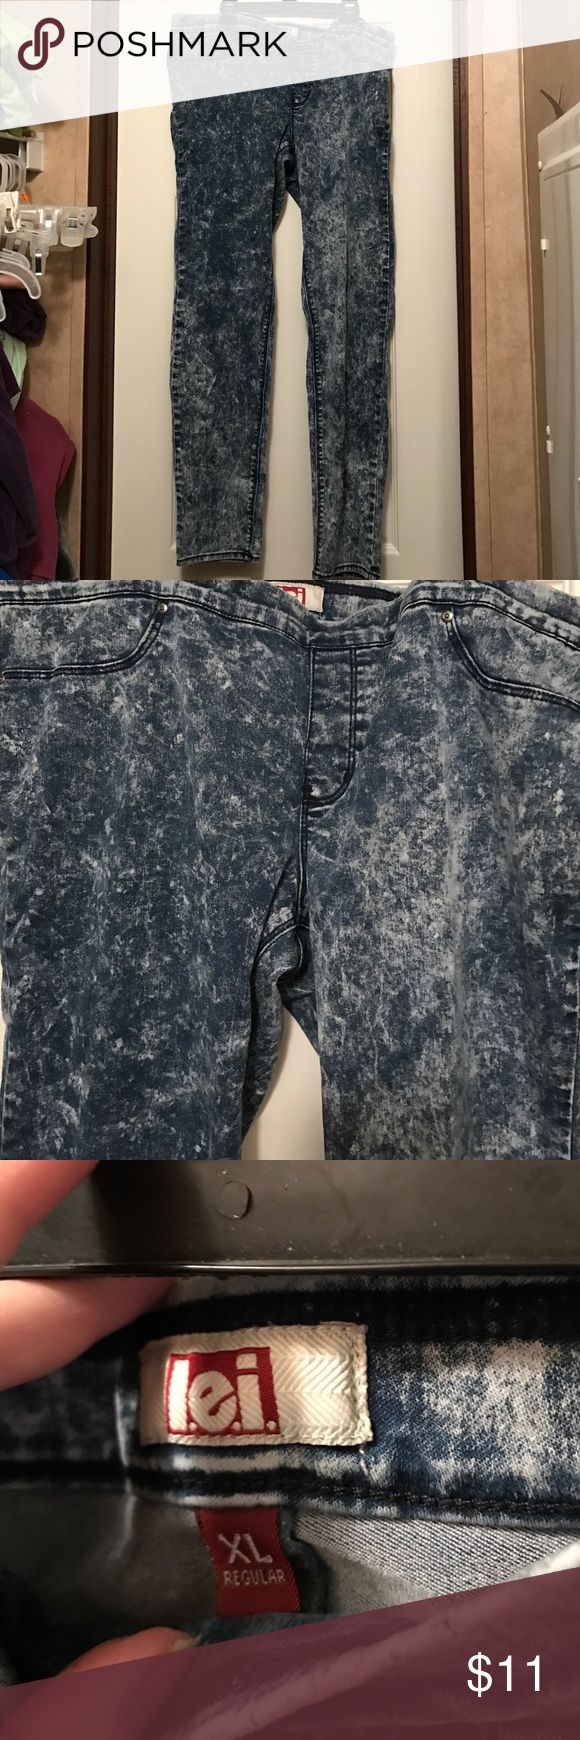 lei stretch jeans size XL EUC, worn once, lei XL stretch jeans l.e.i. Jeans